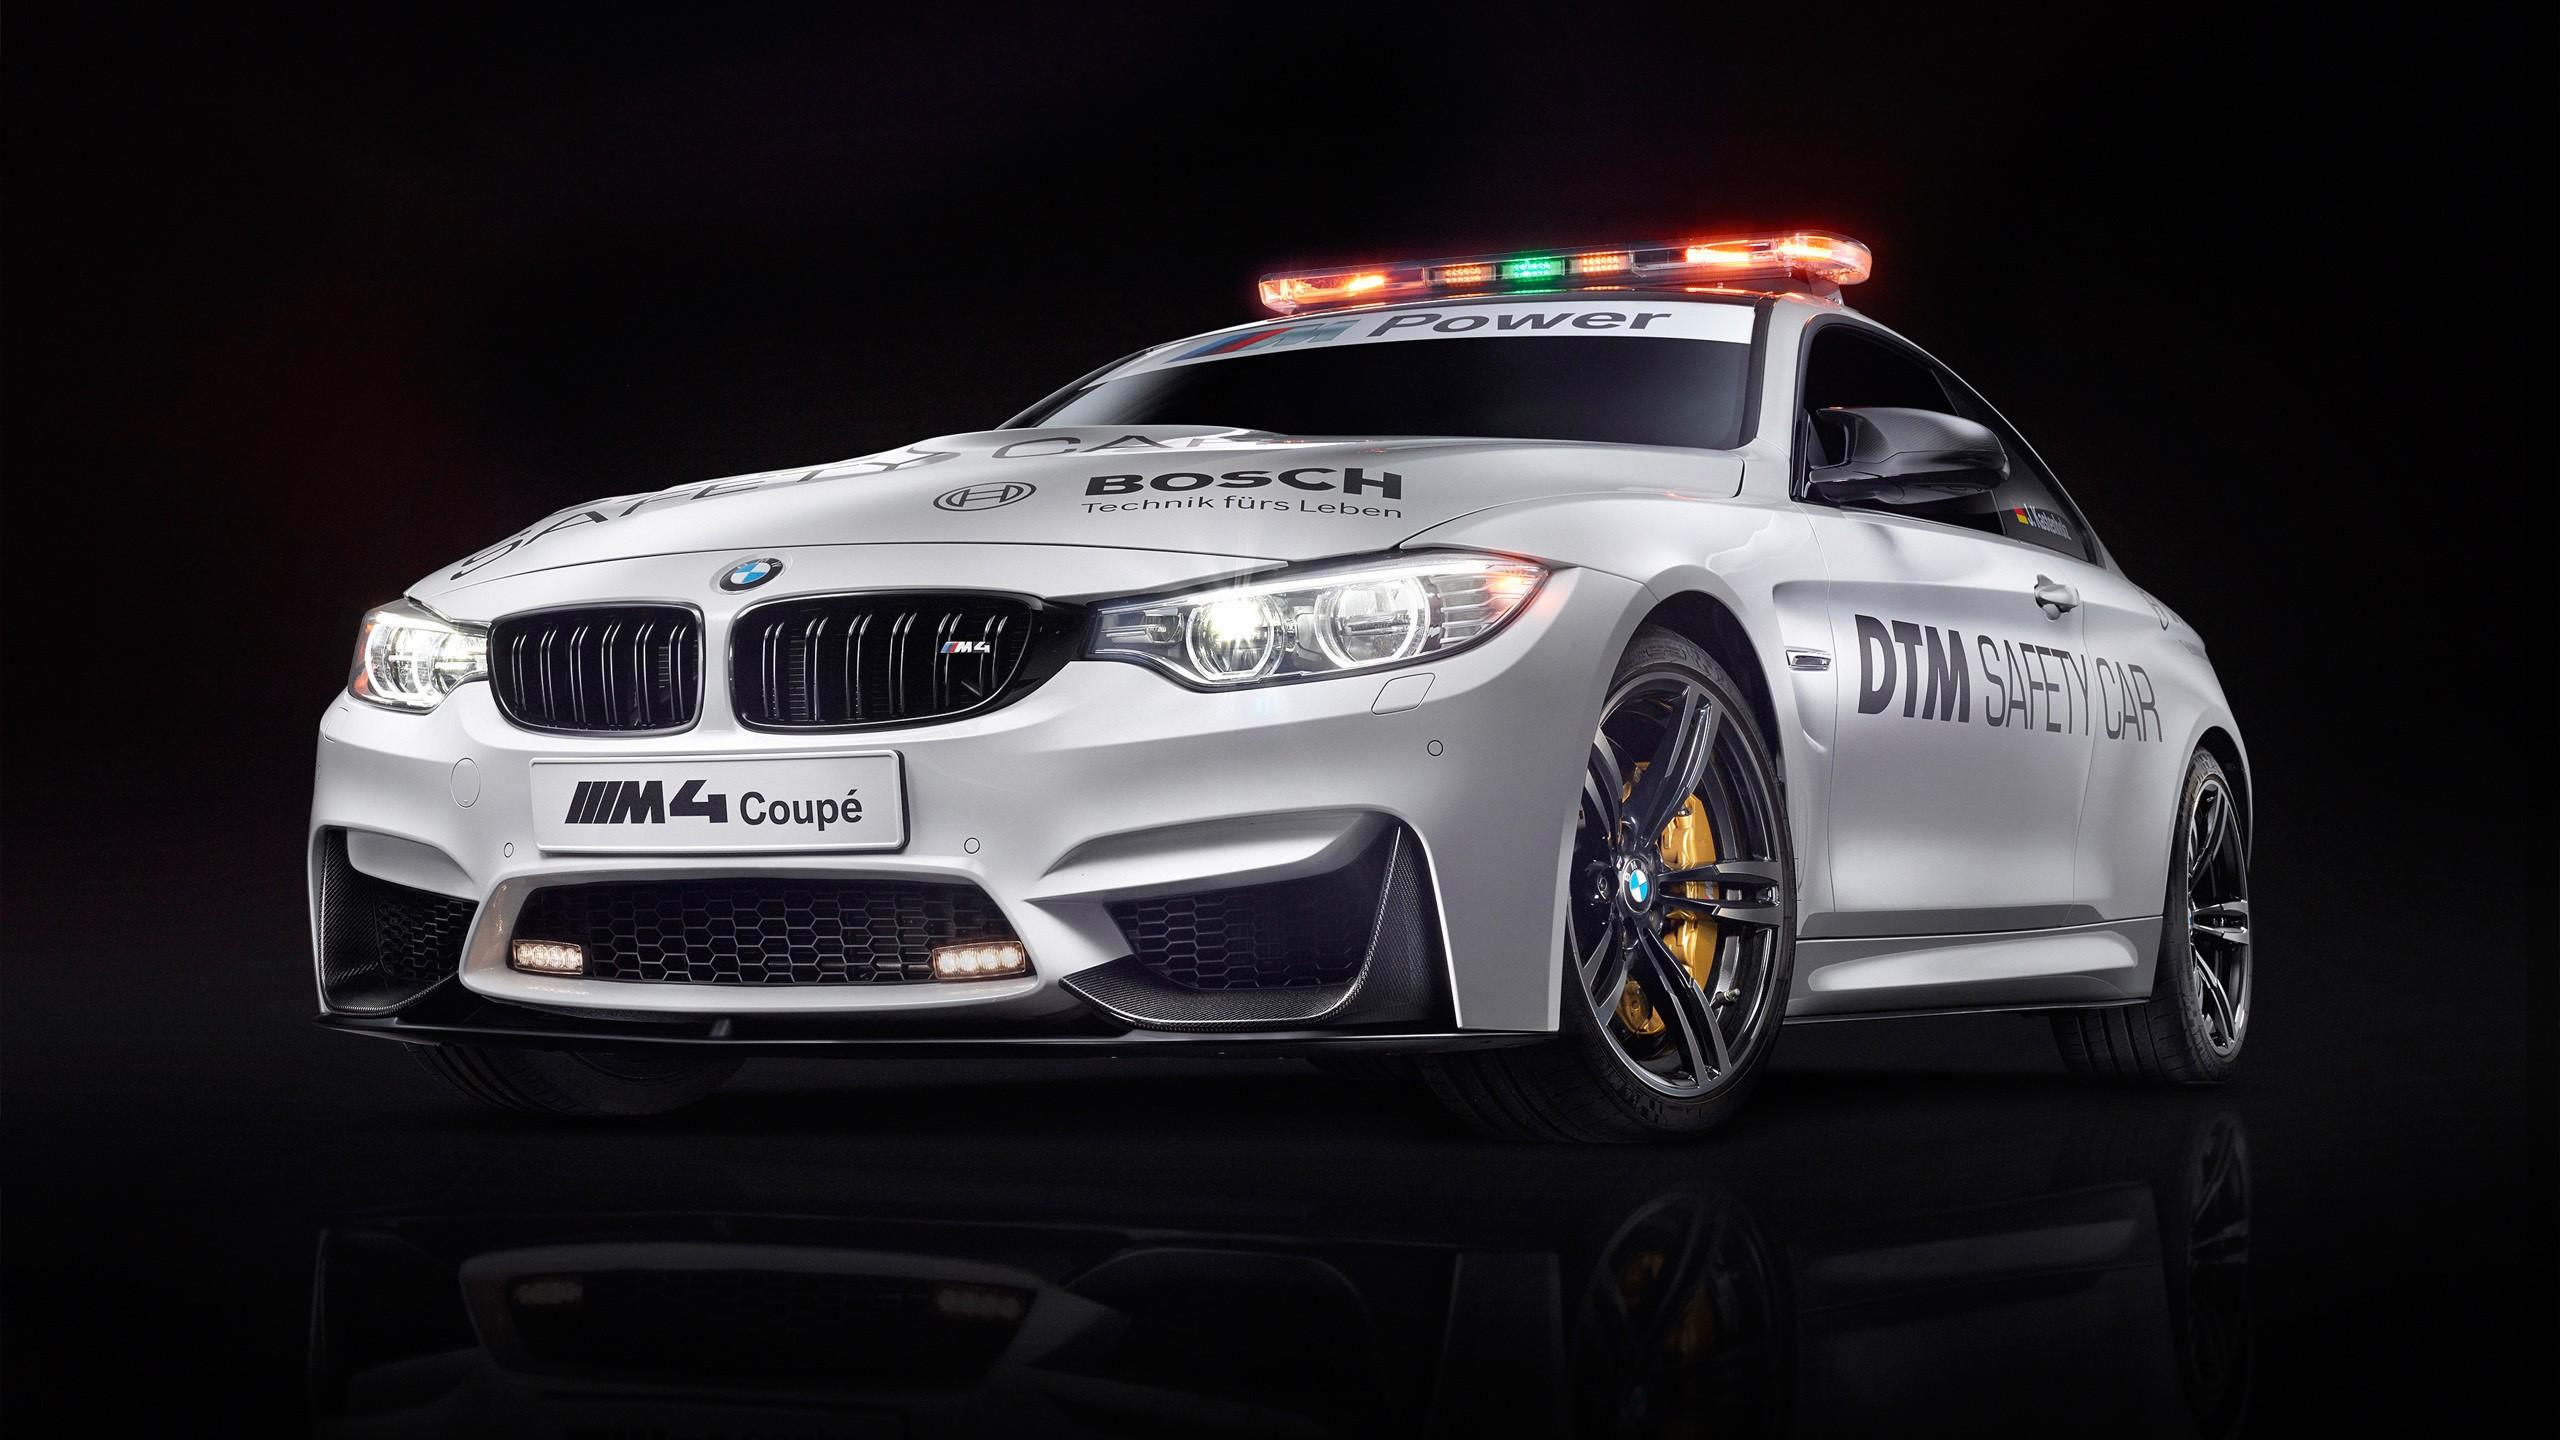 2014 BMW M4 Coupe DTM Safety Car Wallpaper | HD Car ...